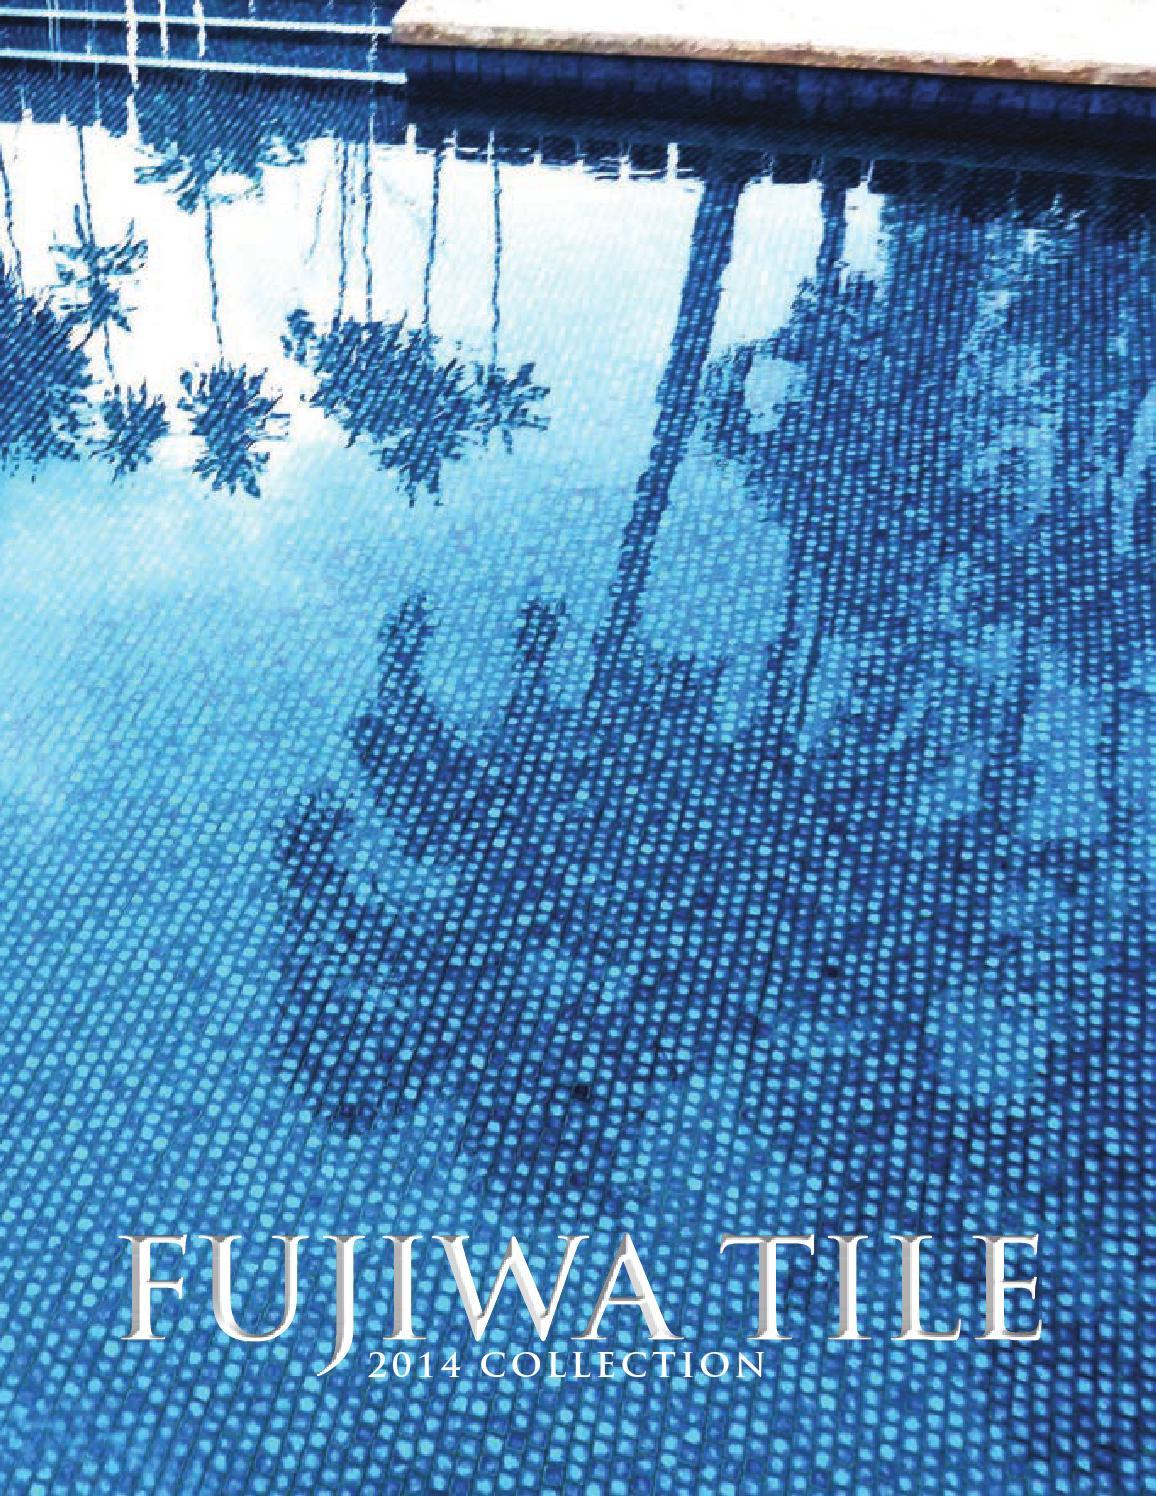 2017 Fujiwa Tiles By Miki Fujiwara Issuu